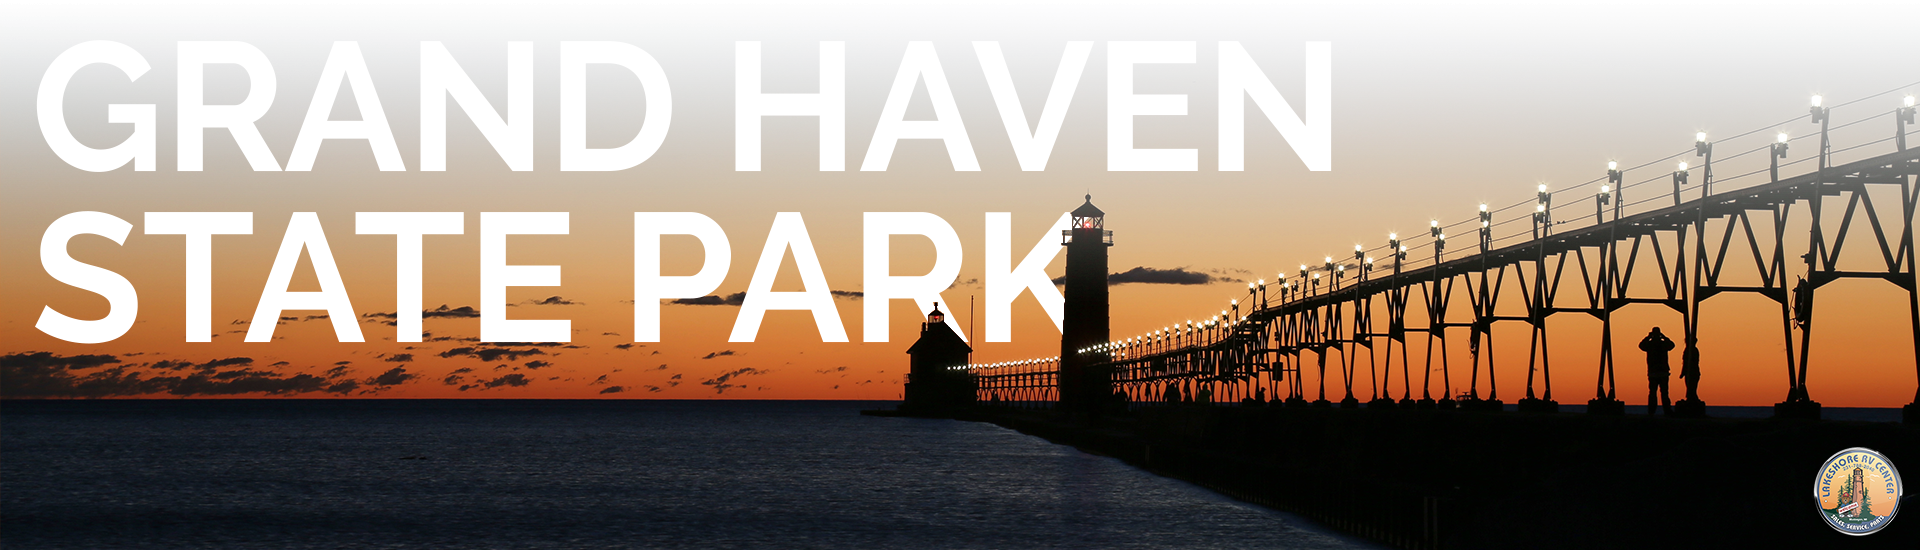 Grand Haven State Park - Awesome Michigan RV Destination